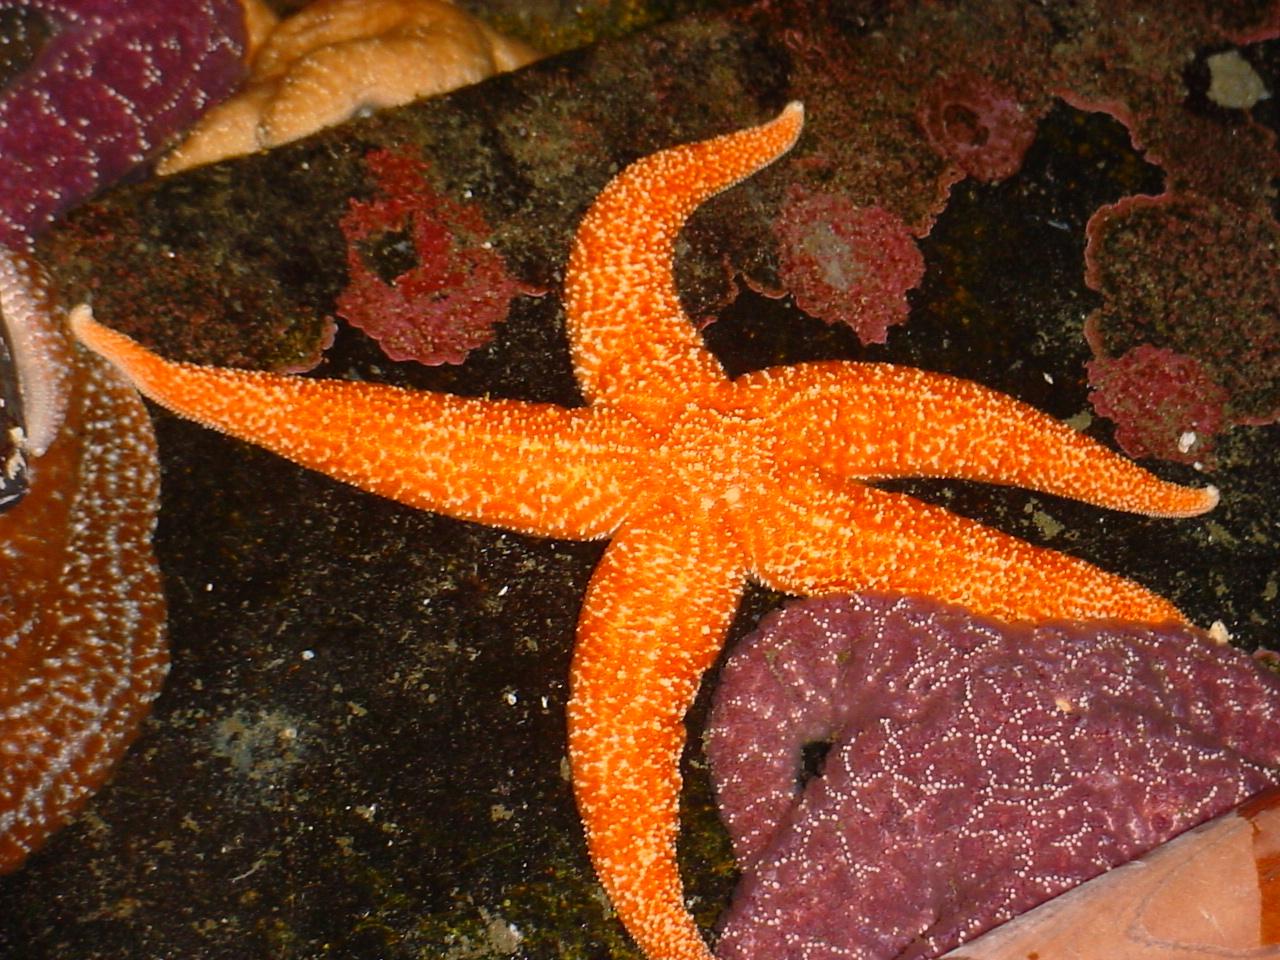 File:Sea stars of oregon.JPG - Wikimedia Commons